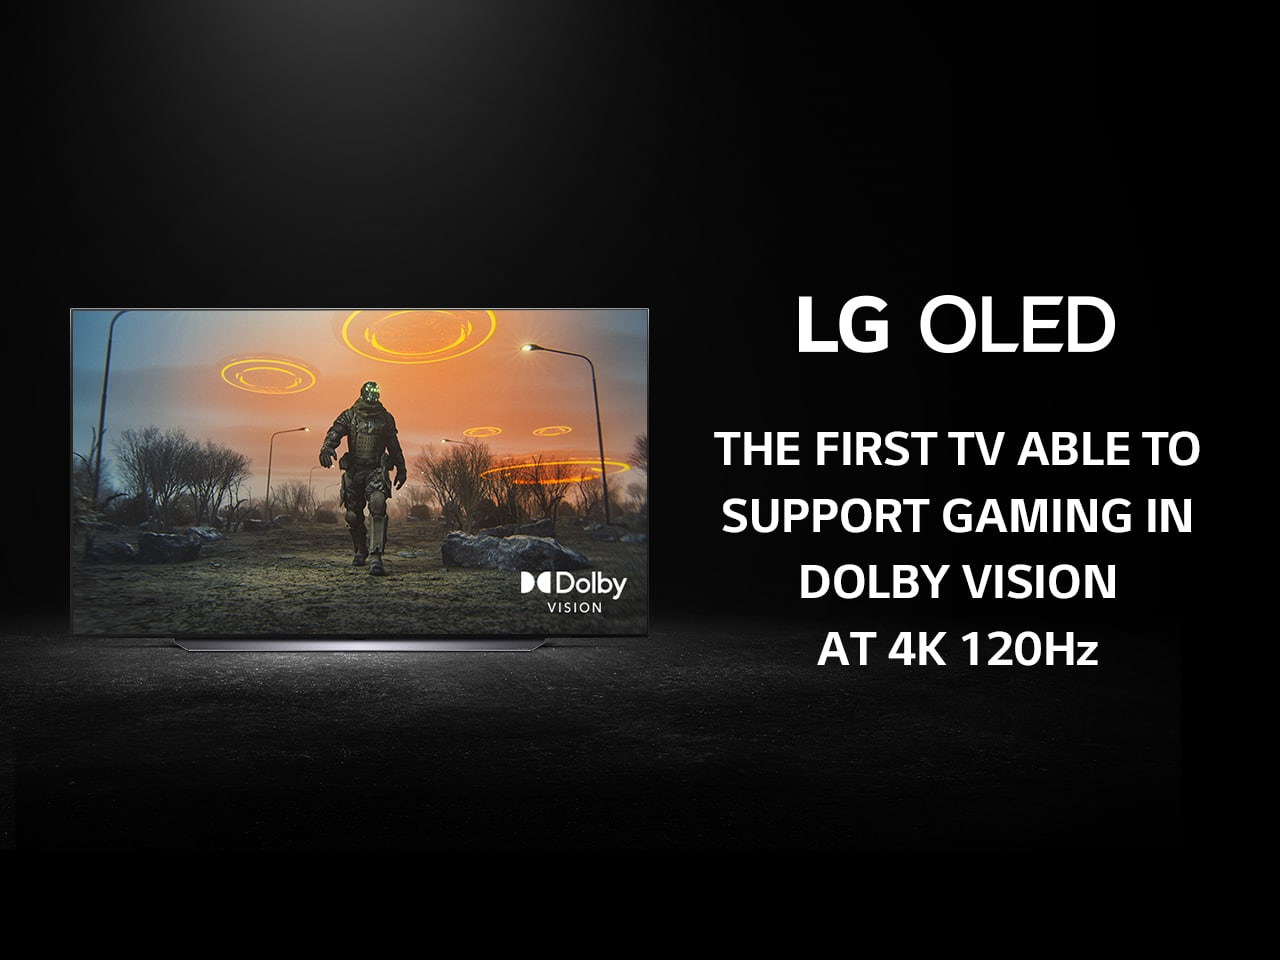 LG OLED TV, arriva la funzionalità Dolby Vision per il gaming thumbnail